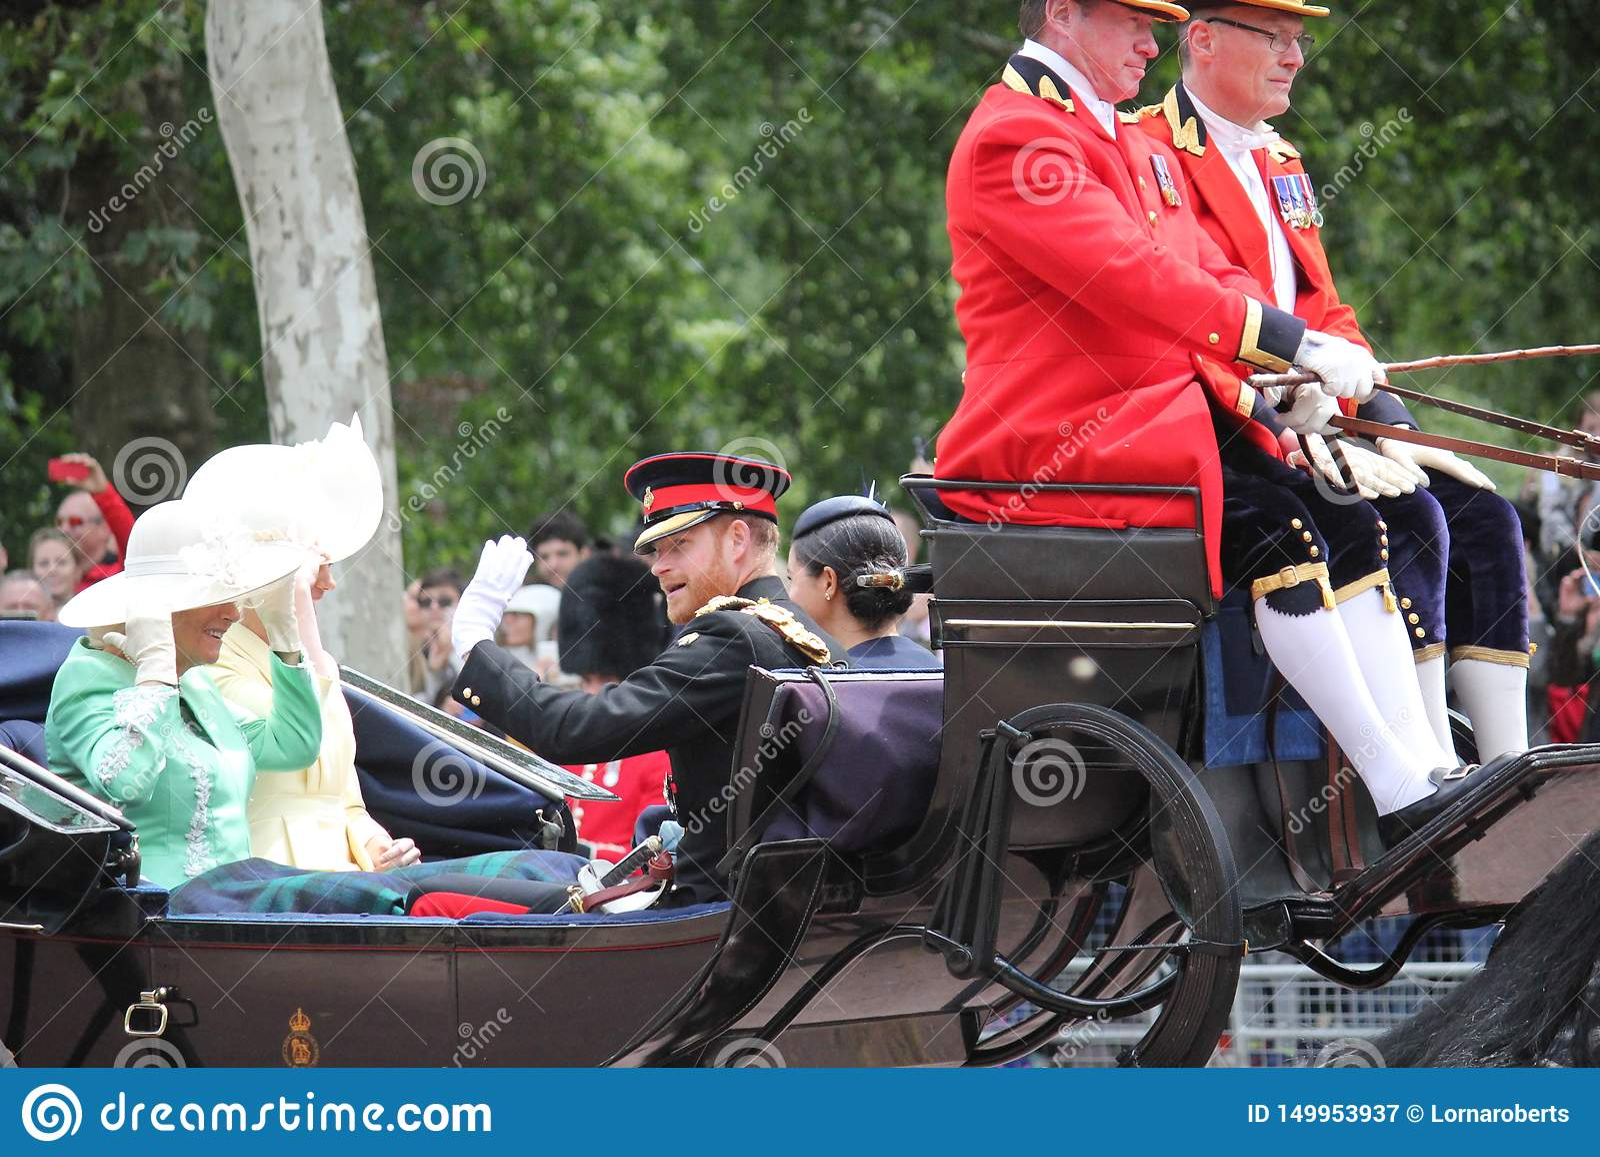 Meghan Markle & απόθεμα του Harry πριγκήπων, Λονδίνο UK, στις 8 Ιουνίου 2019 - πρίγκηπας Harry της Meghan Markle που συγκεντρώνετ